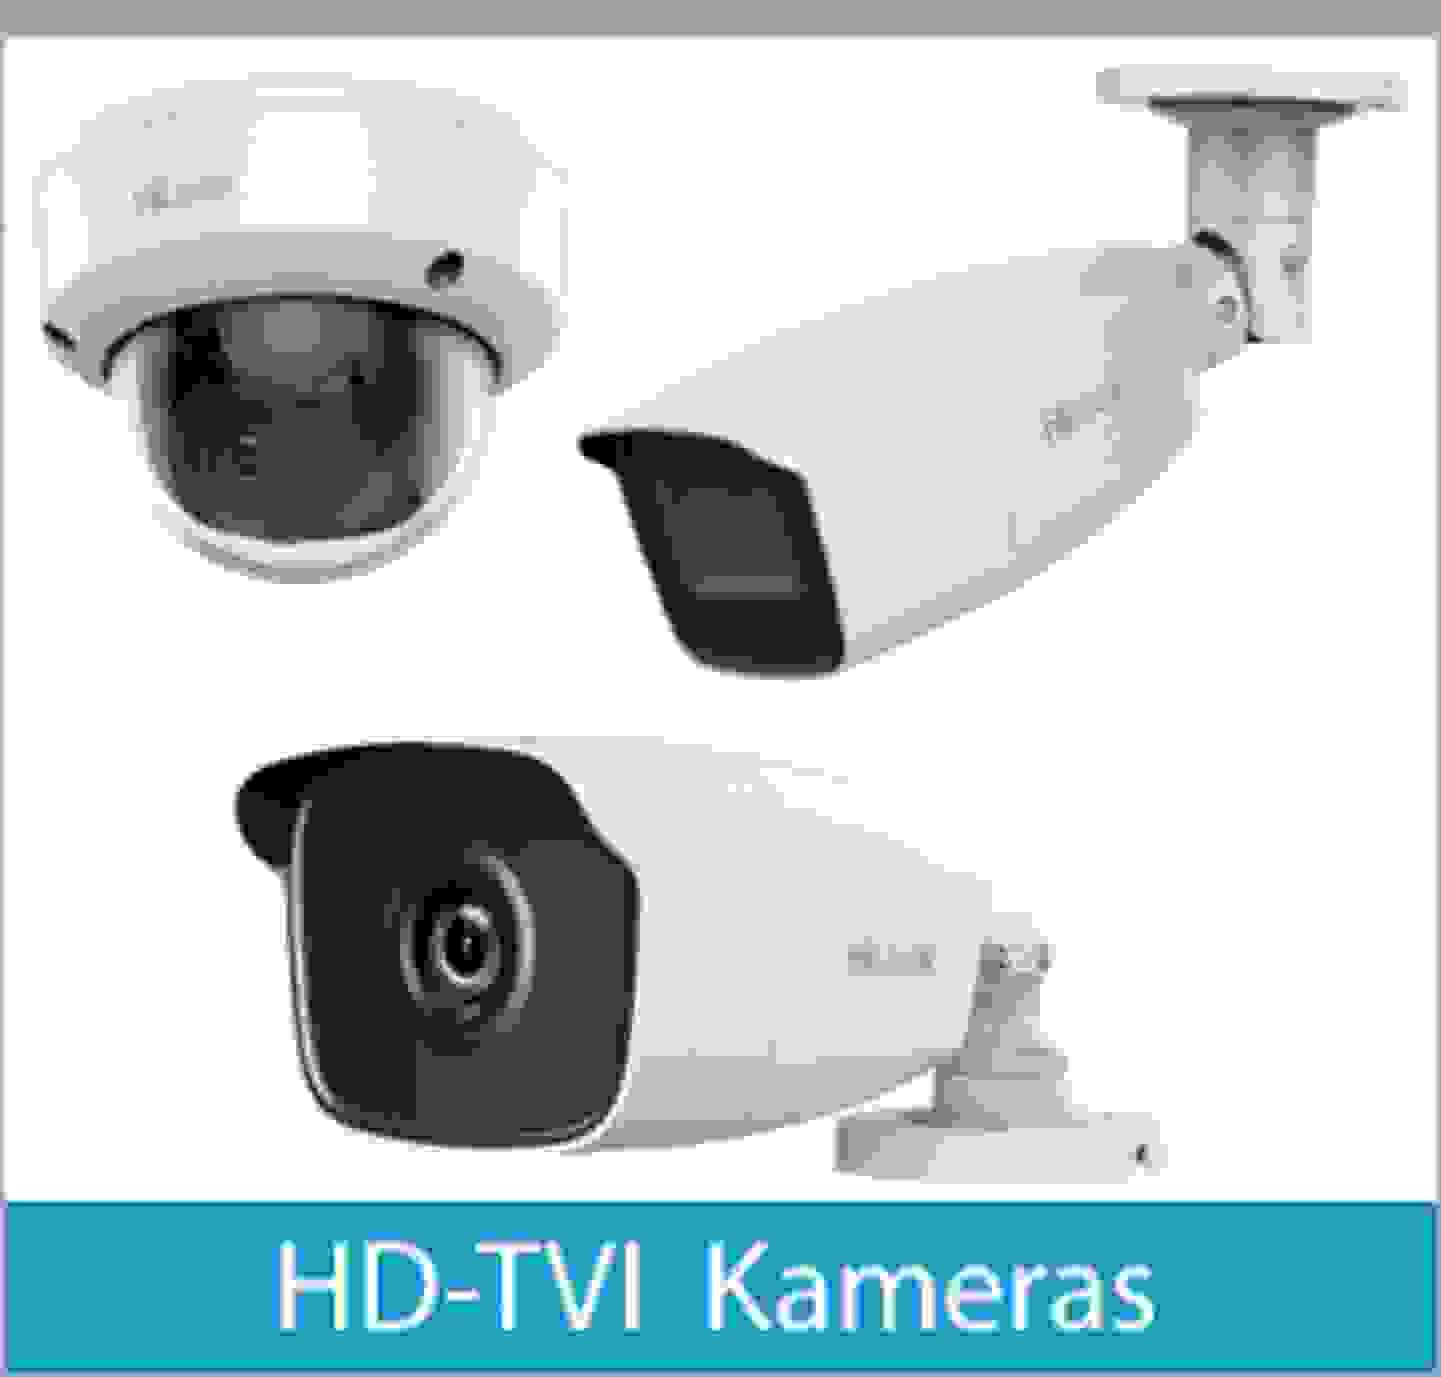 HD-TVI Kameras